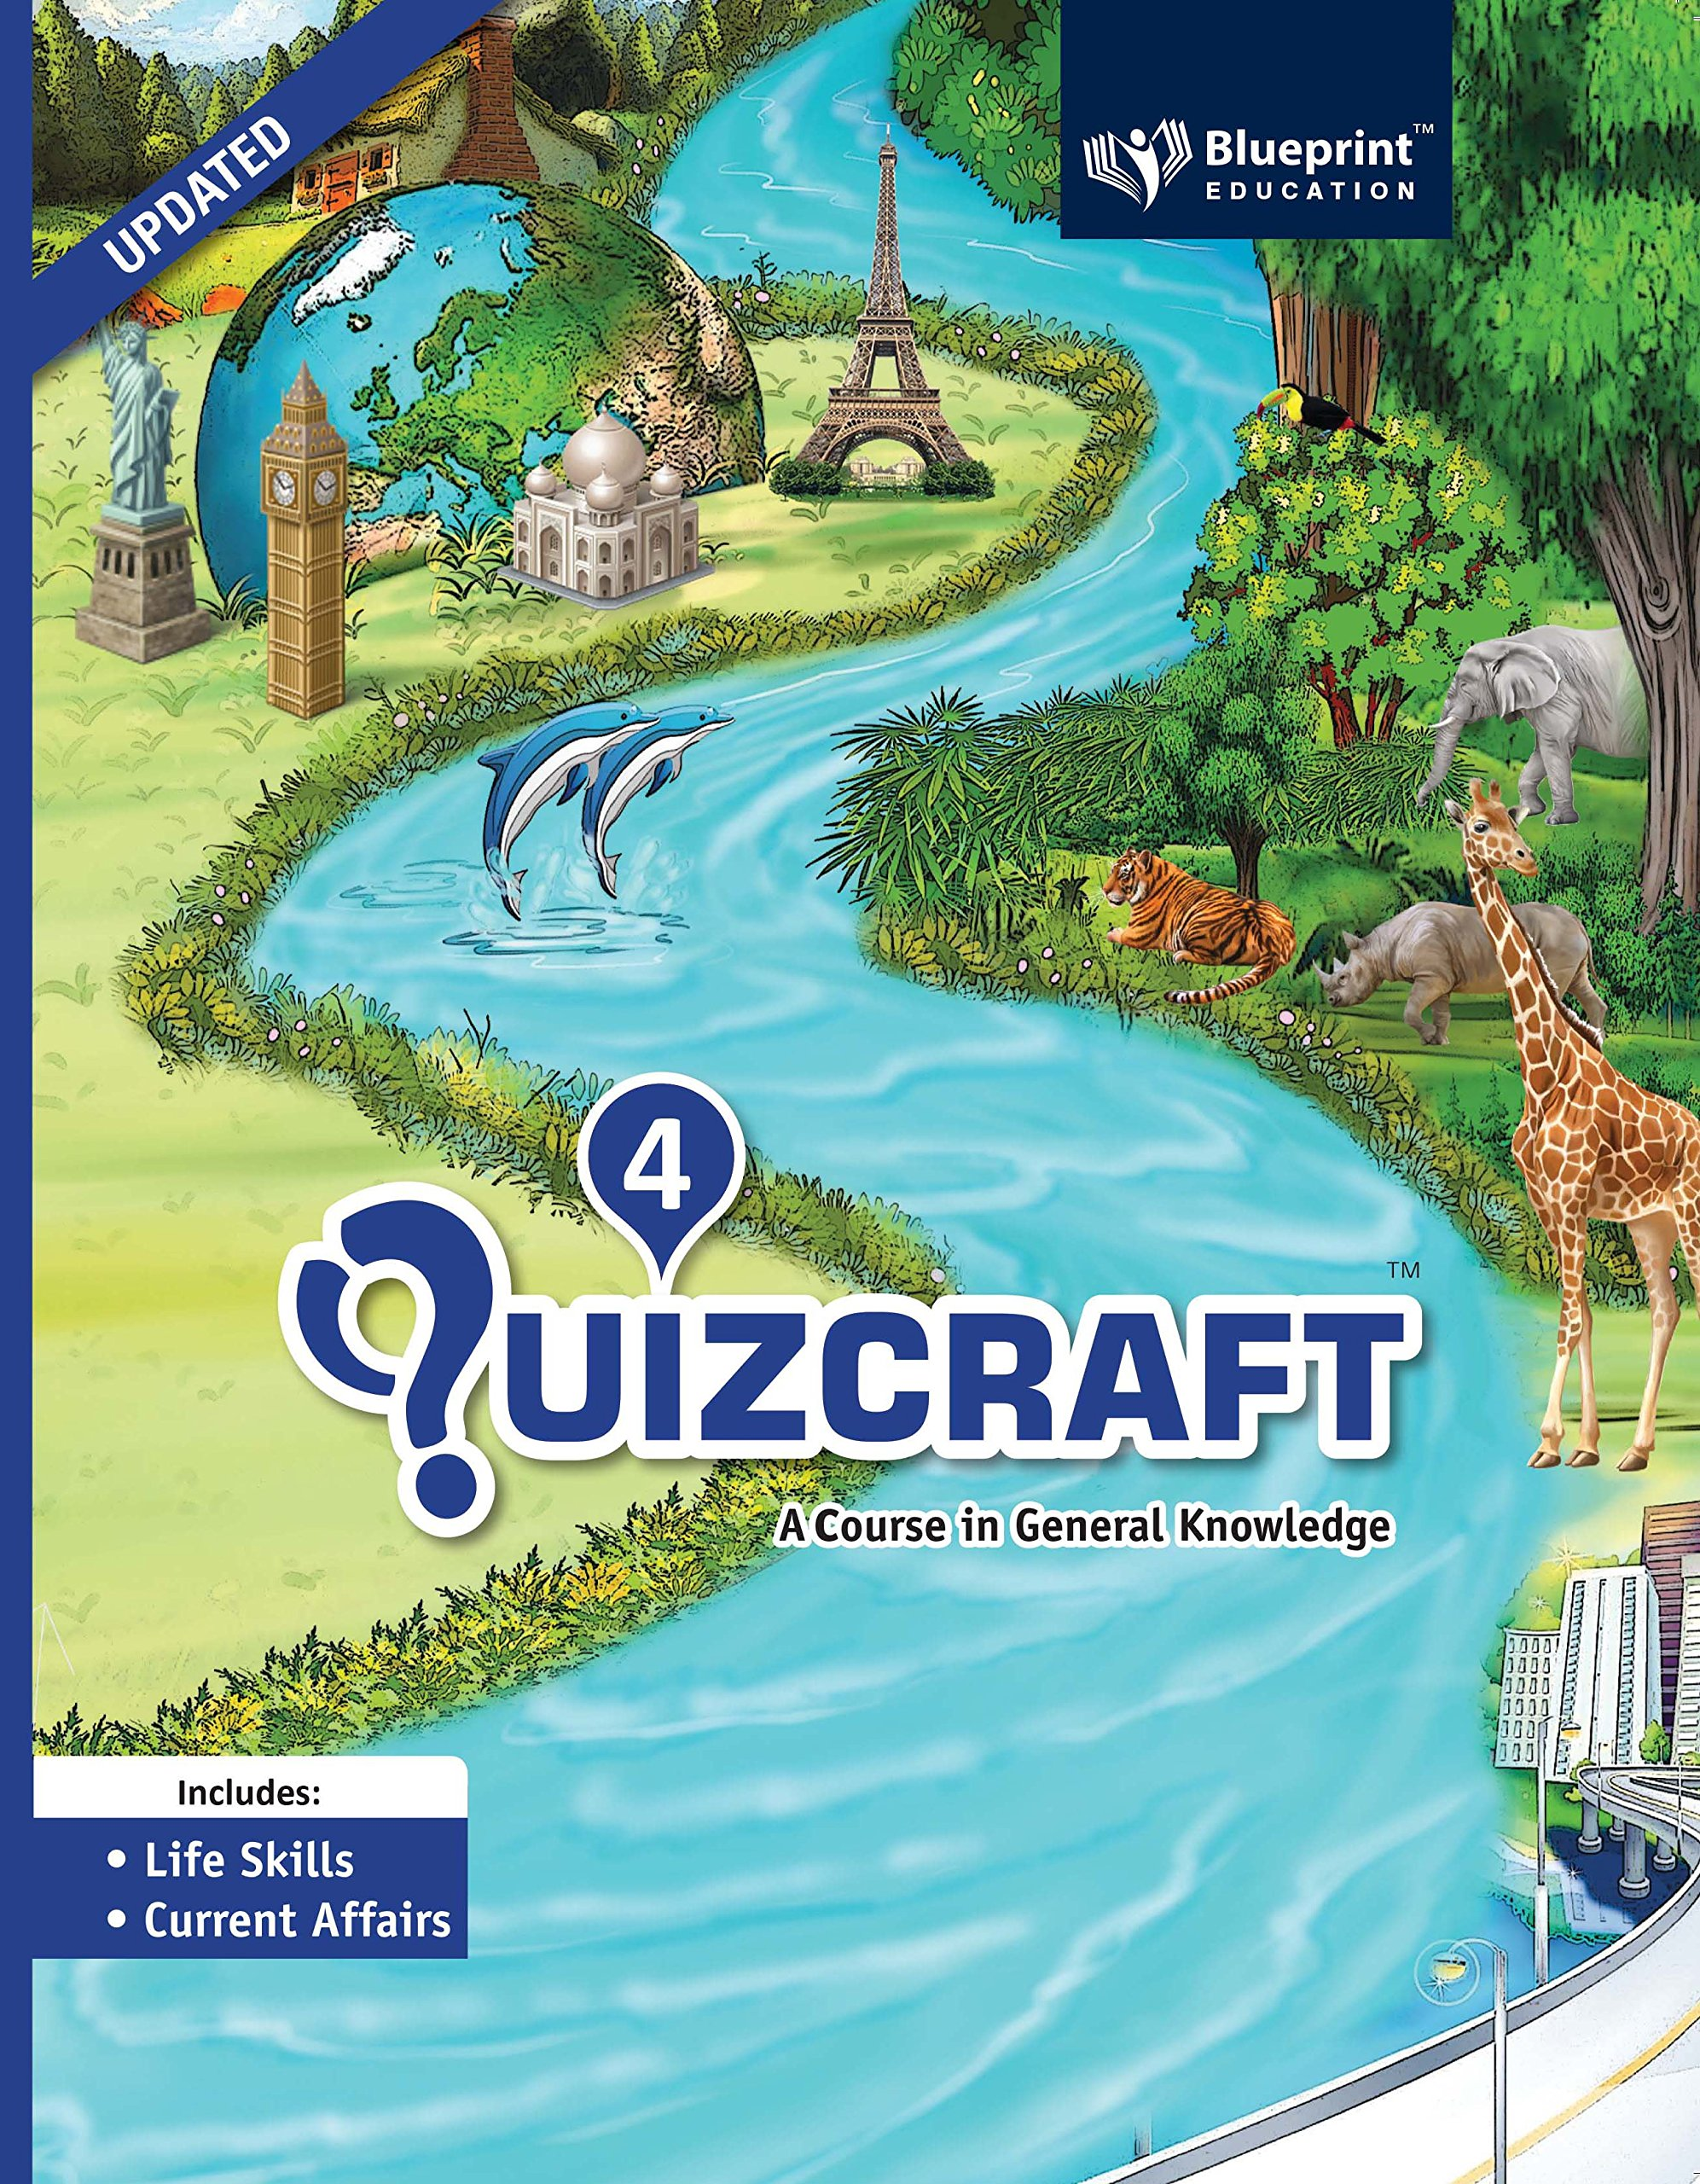 Quizcraft 4 amazon ajay poonia abhiram books malvernweather Choice Image